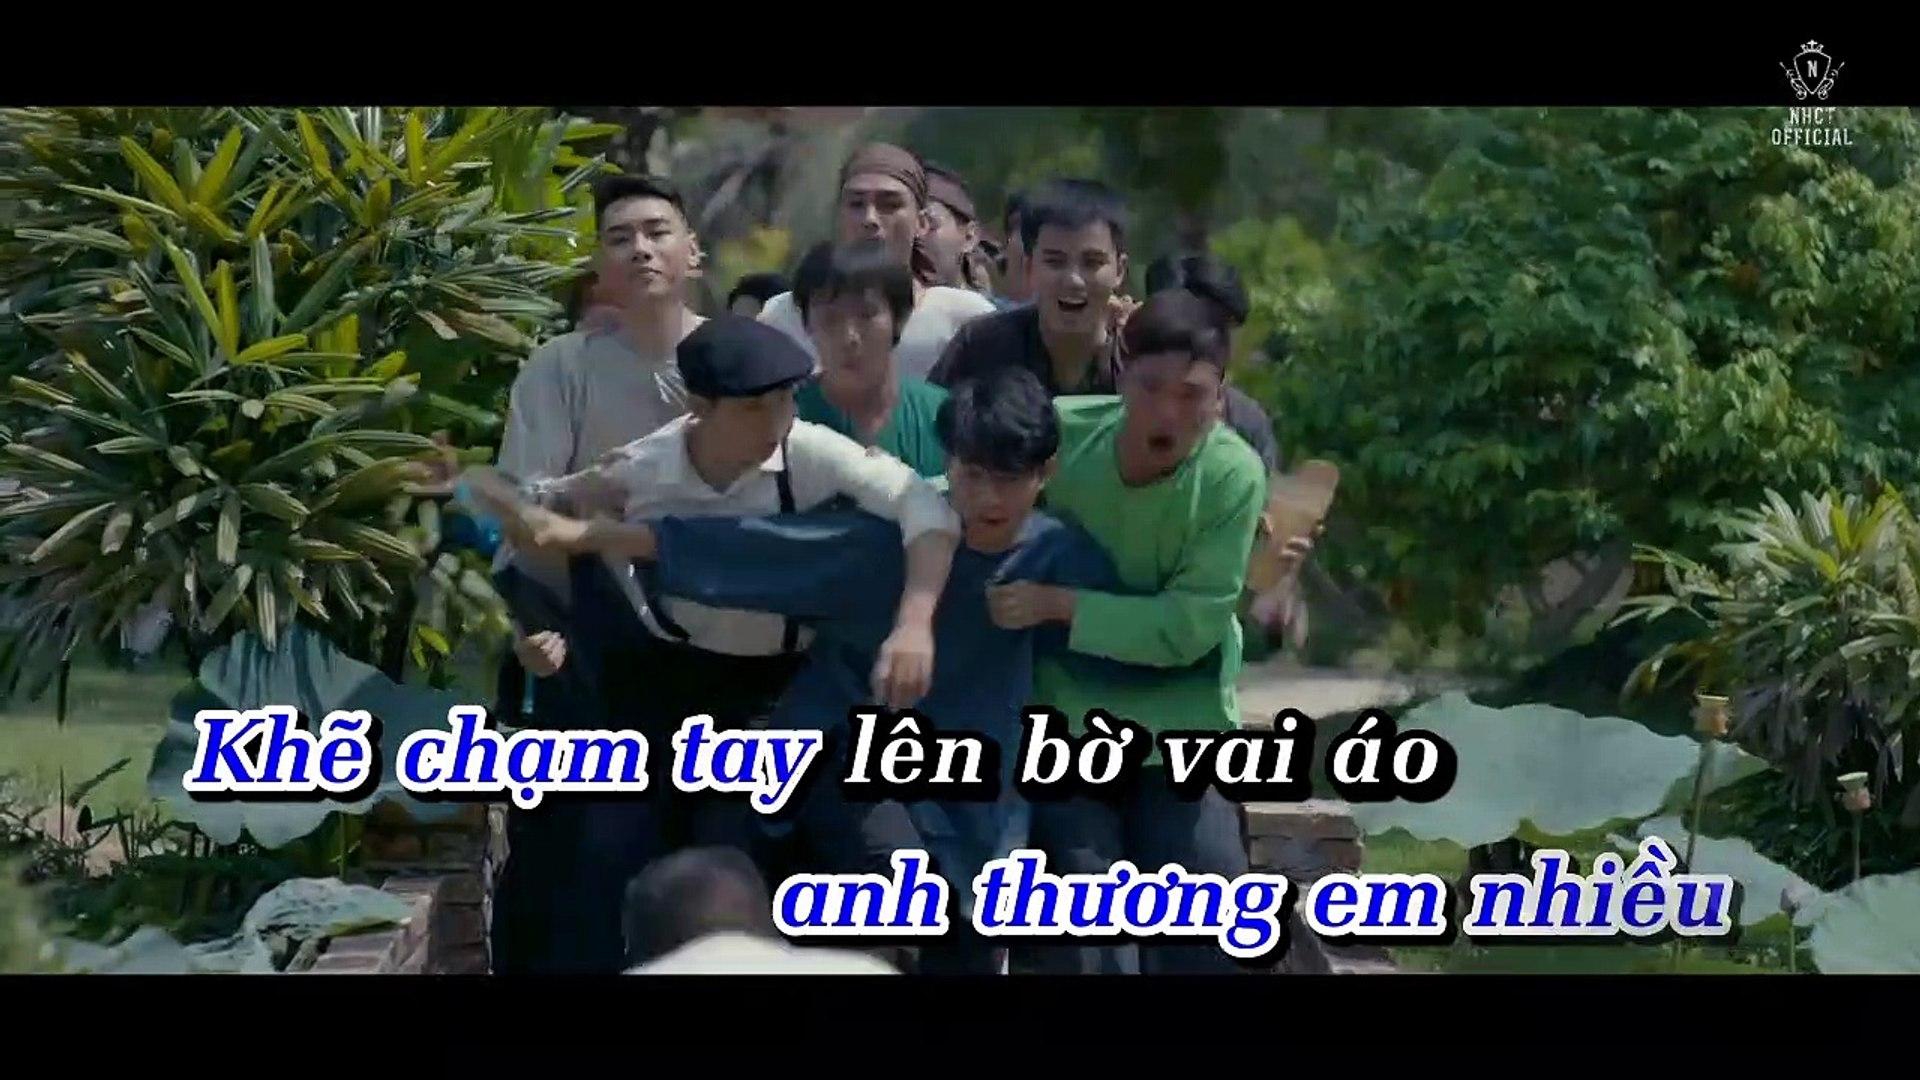 [Karaoke] Tỏ Tình - Jang Nguyễn Ft. K-ICM [Beat Hạ Tone]